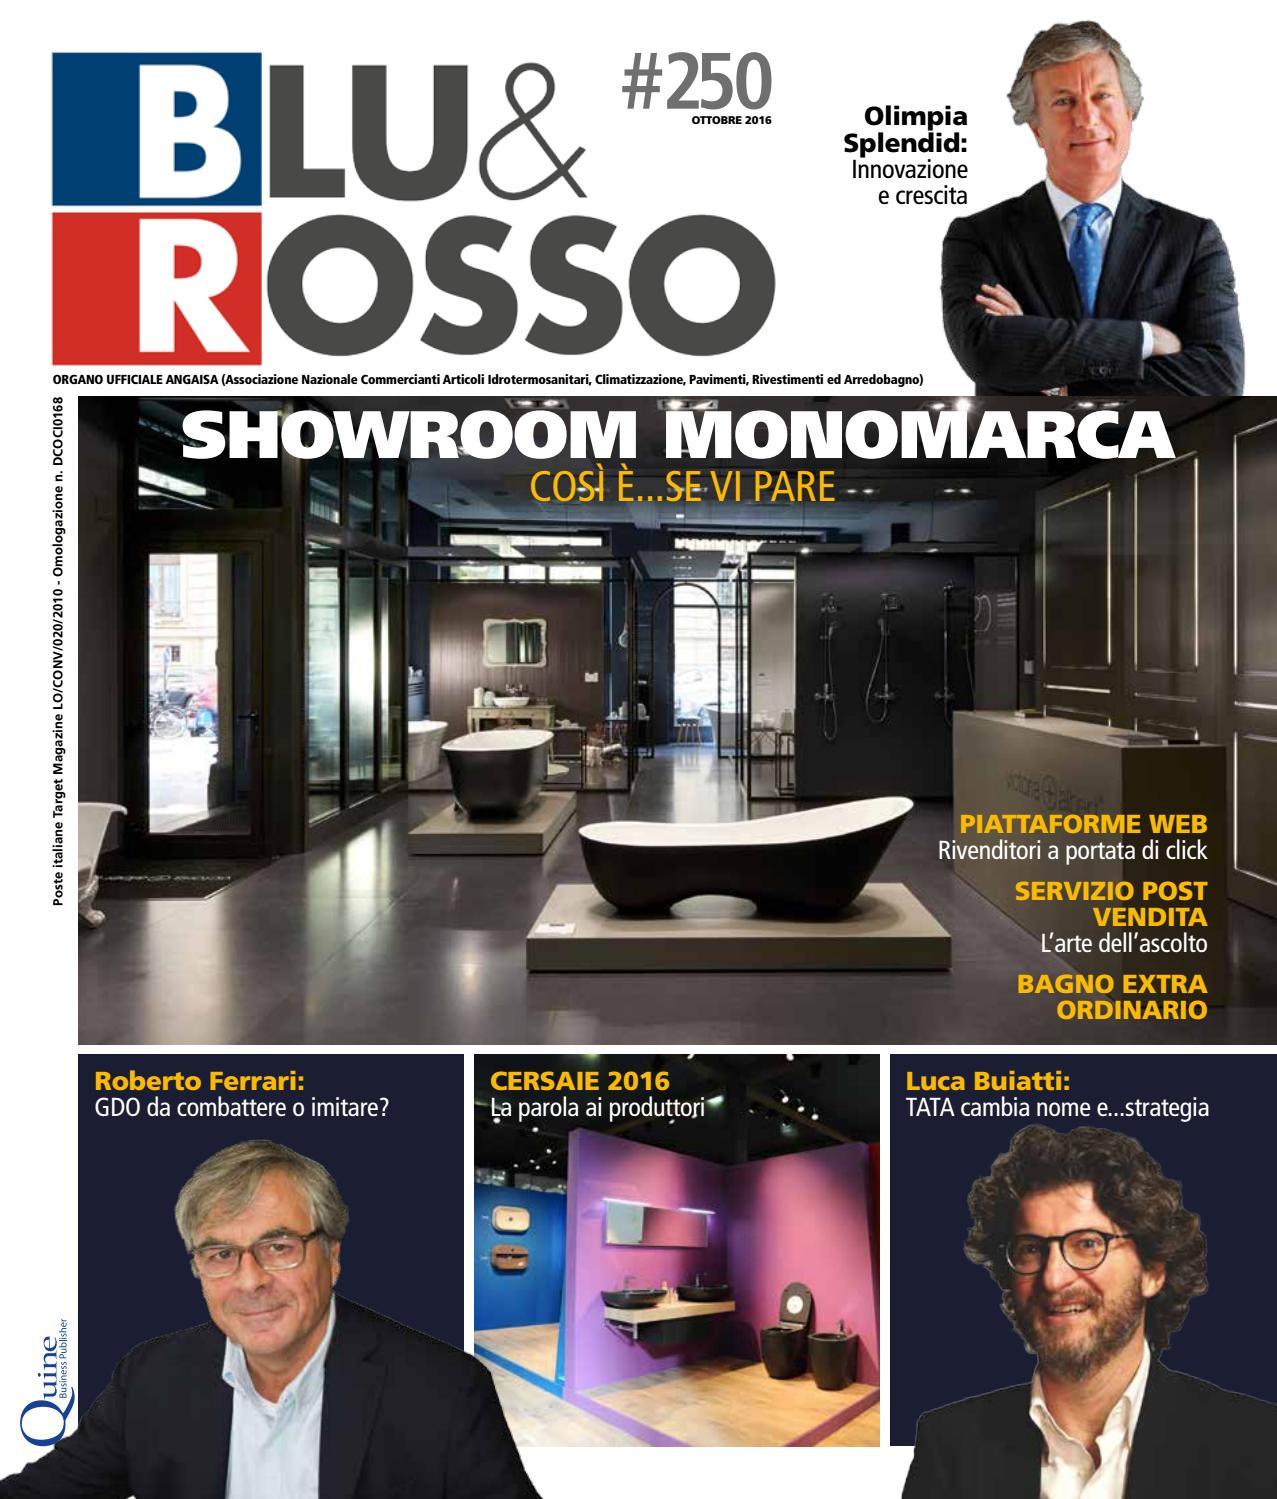 Sanitaria Lodigiana Arredo Bagno.Blu Rosso 250 Ottobre By Quine Business Publisher Issuu